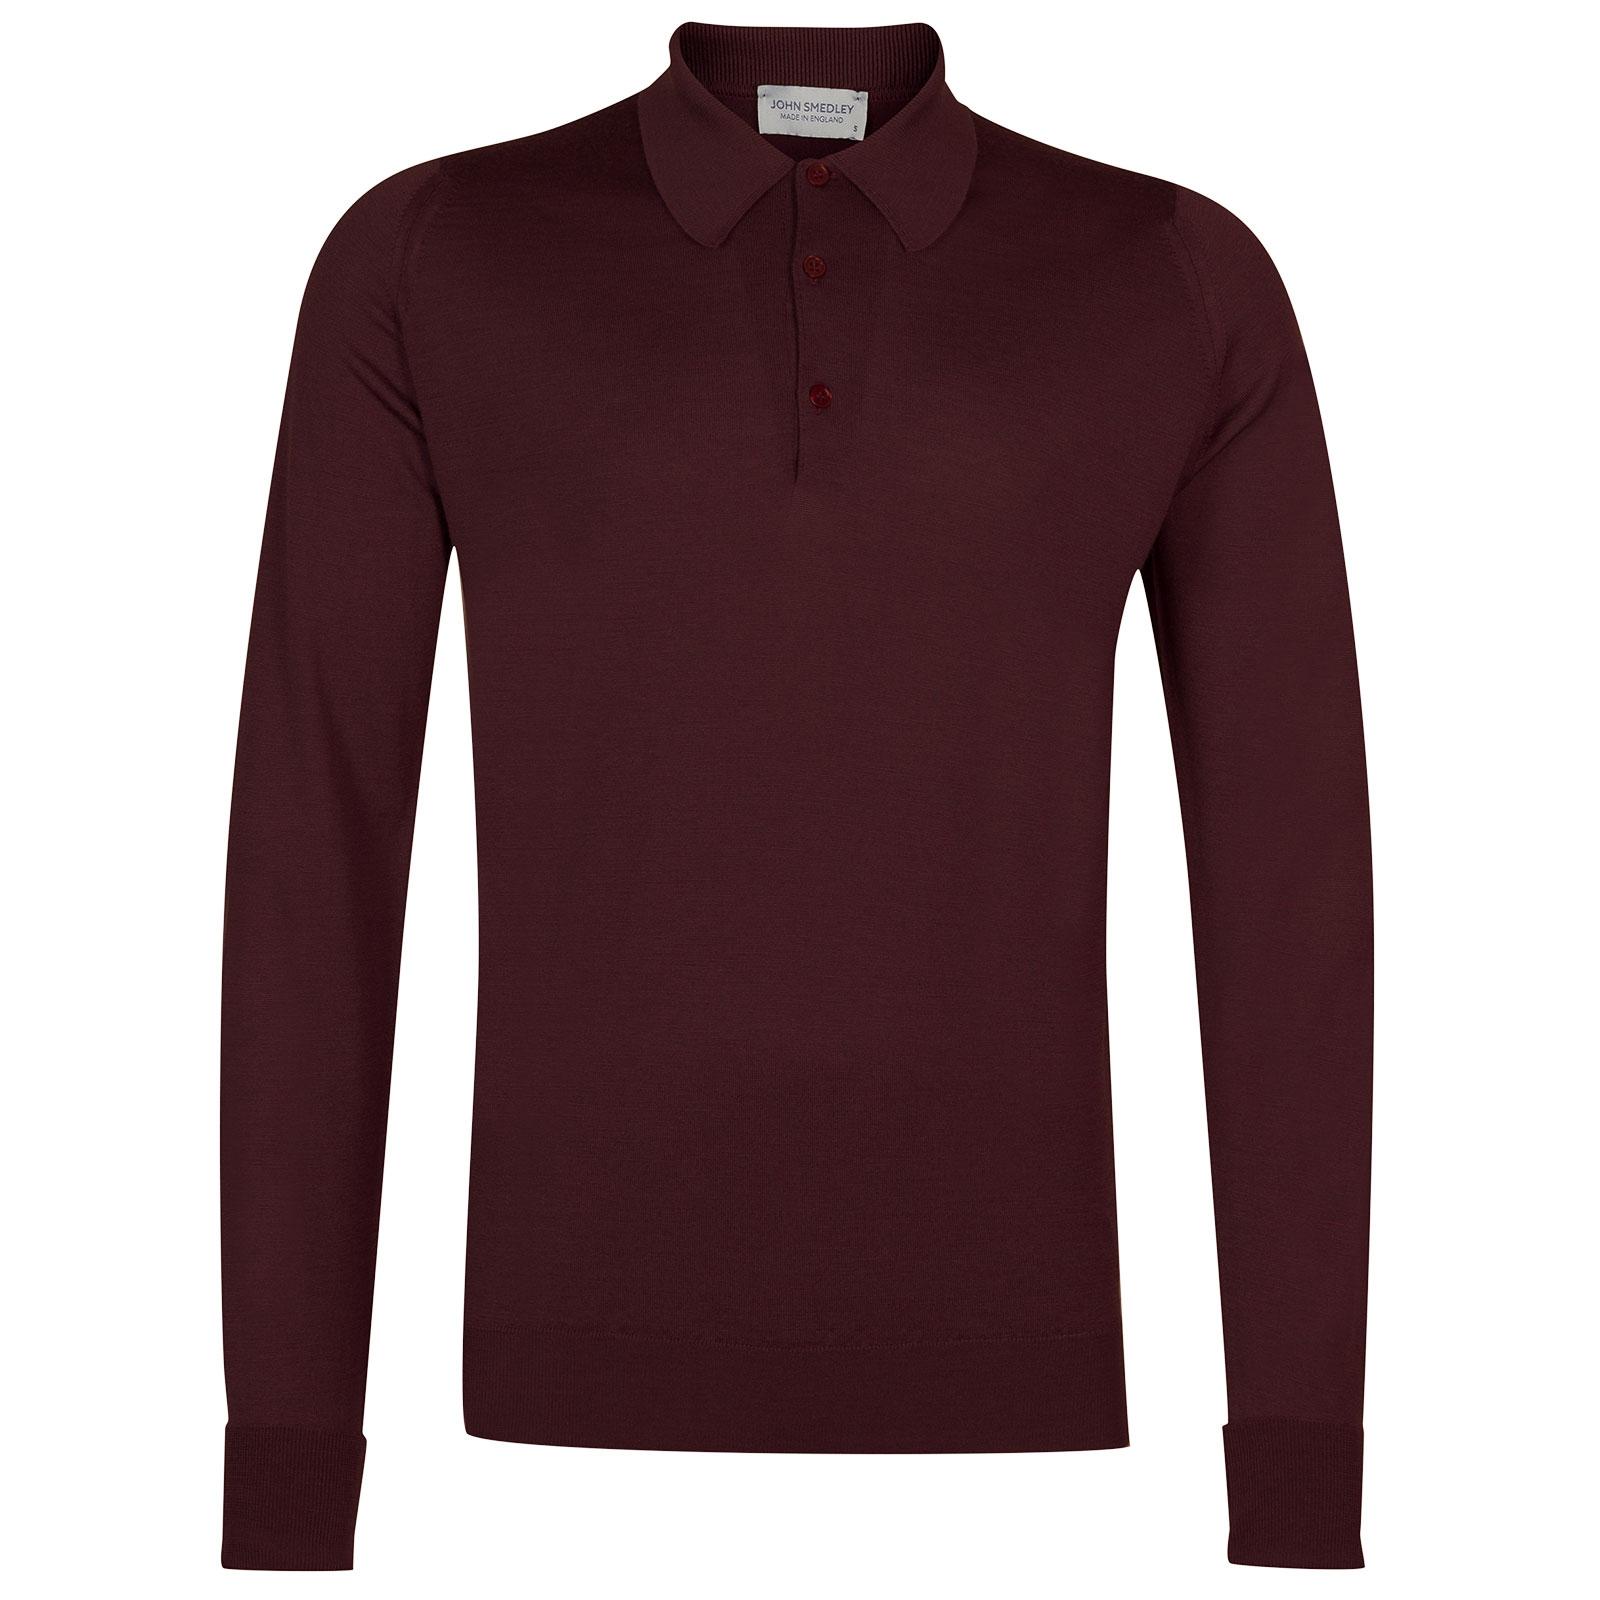 John Smedley dorset Merino Wool Shirt in Maroon Blaze-S